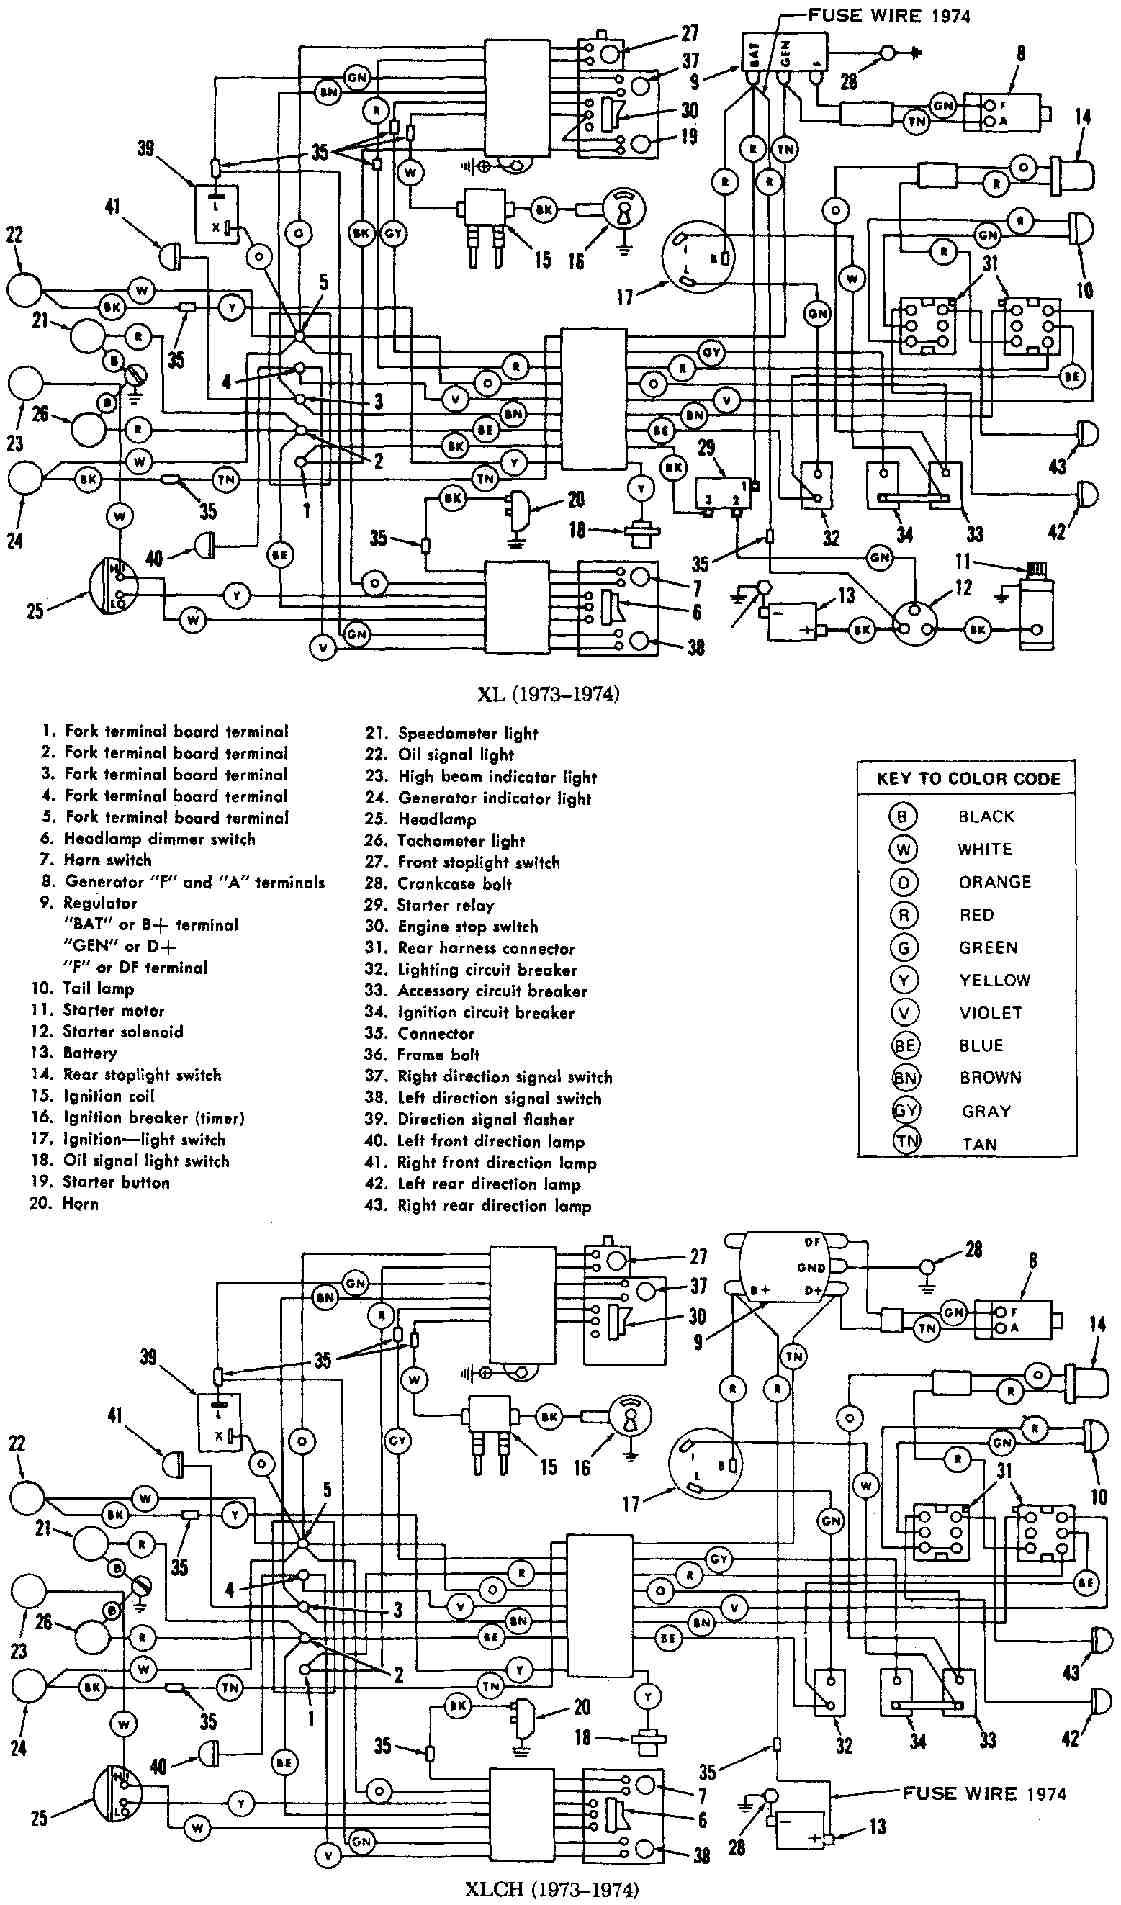 harley davidson wiring diagram manual harley image harley davidson servi car wiring diagram electrical wiring on harley davidson wiring diagram manual